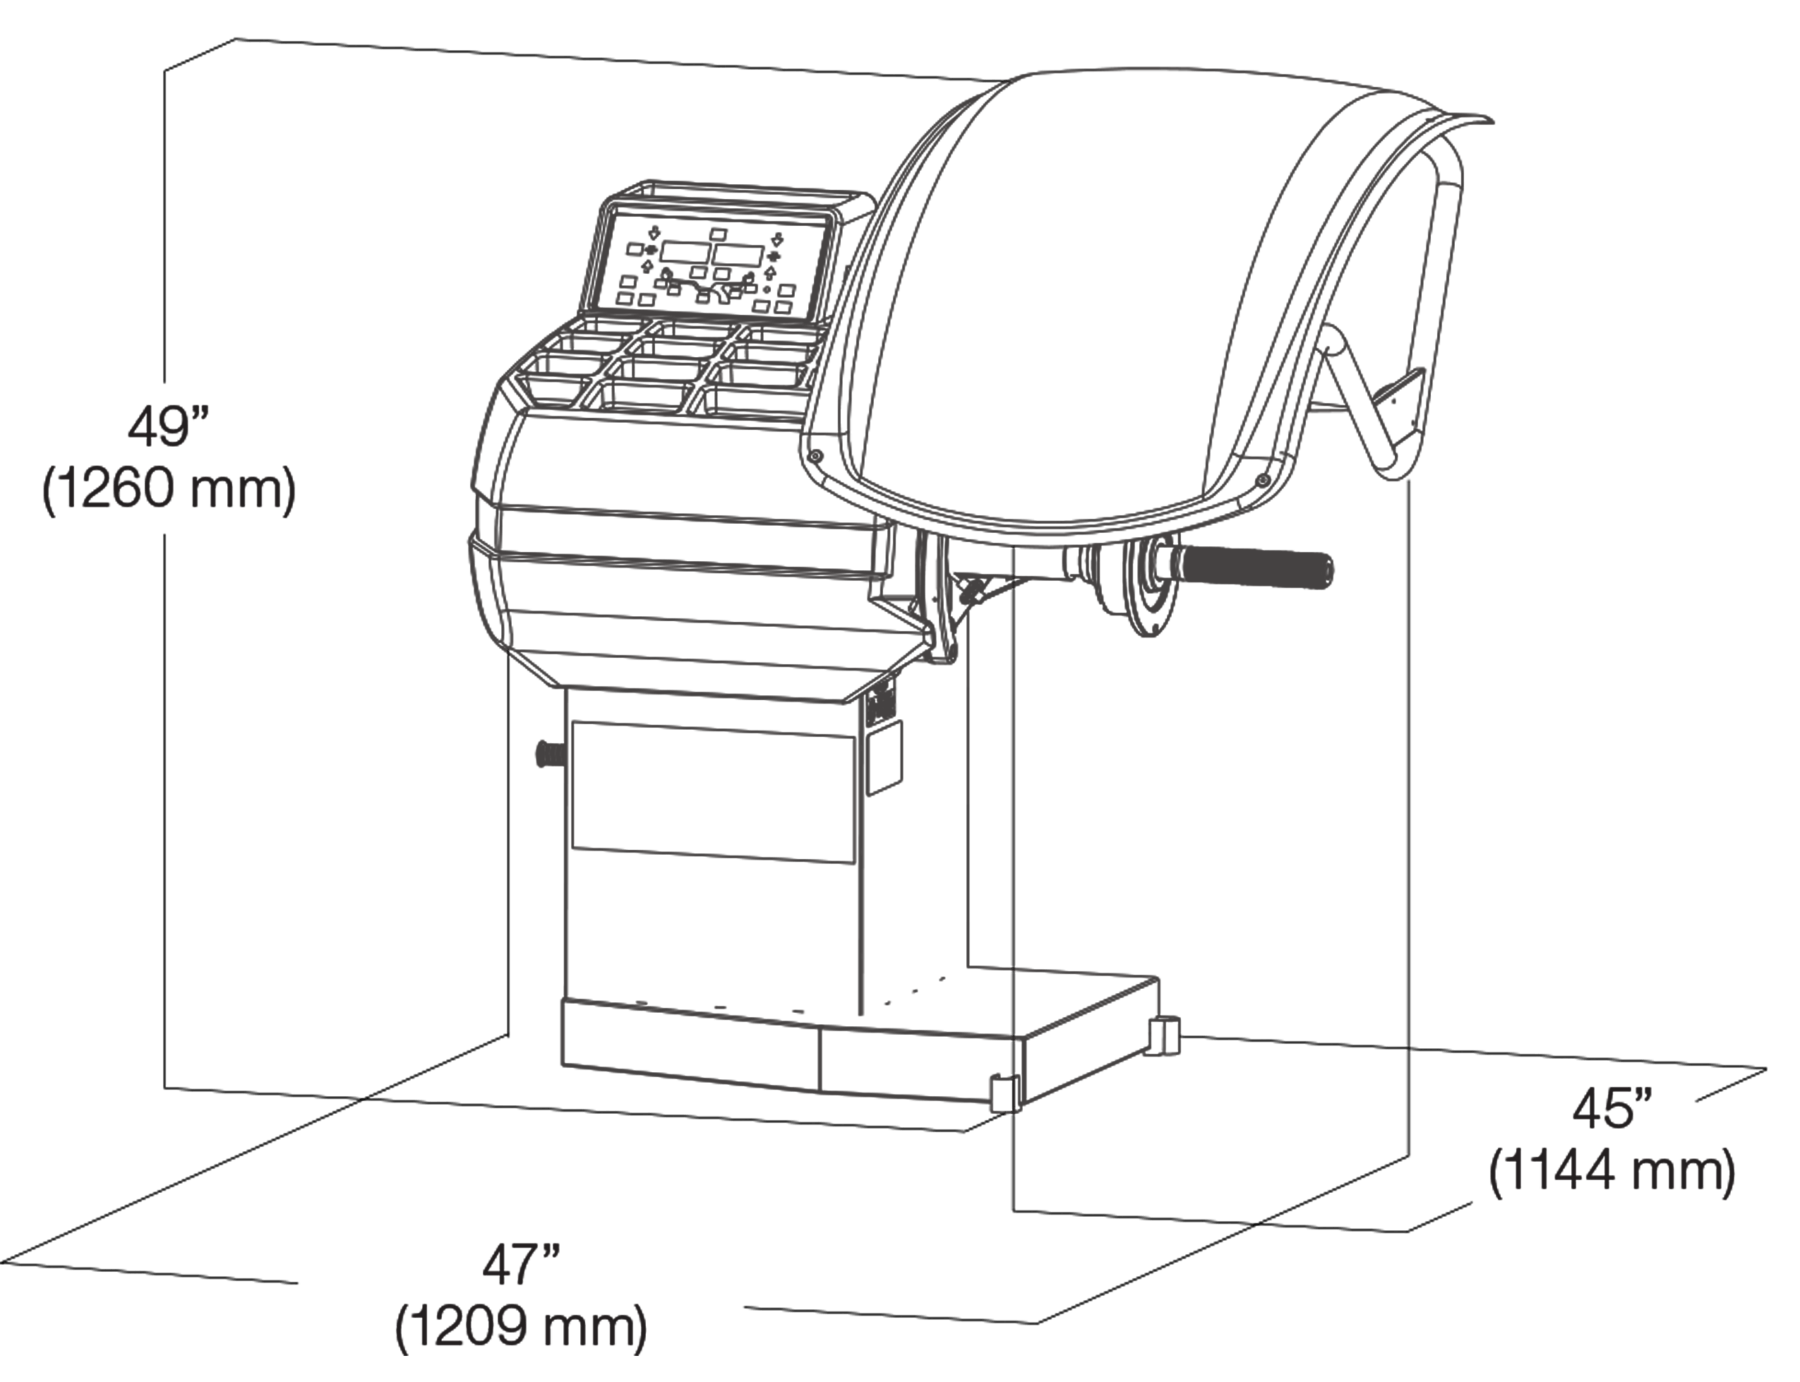 Cemb ER71 Auto Data Entry Wheel Balancer Dimensions